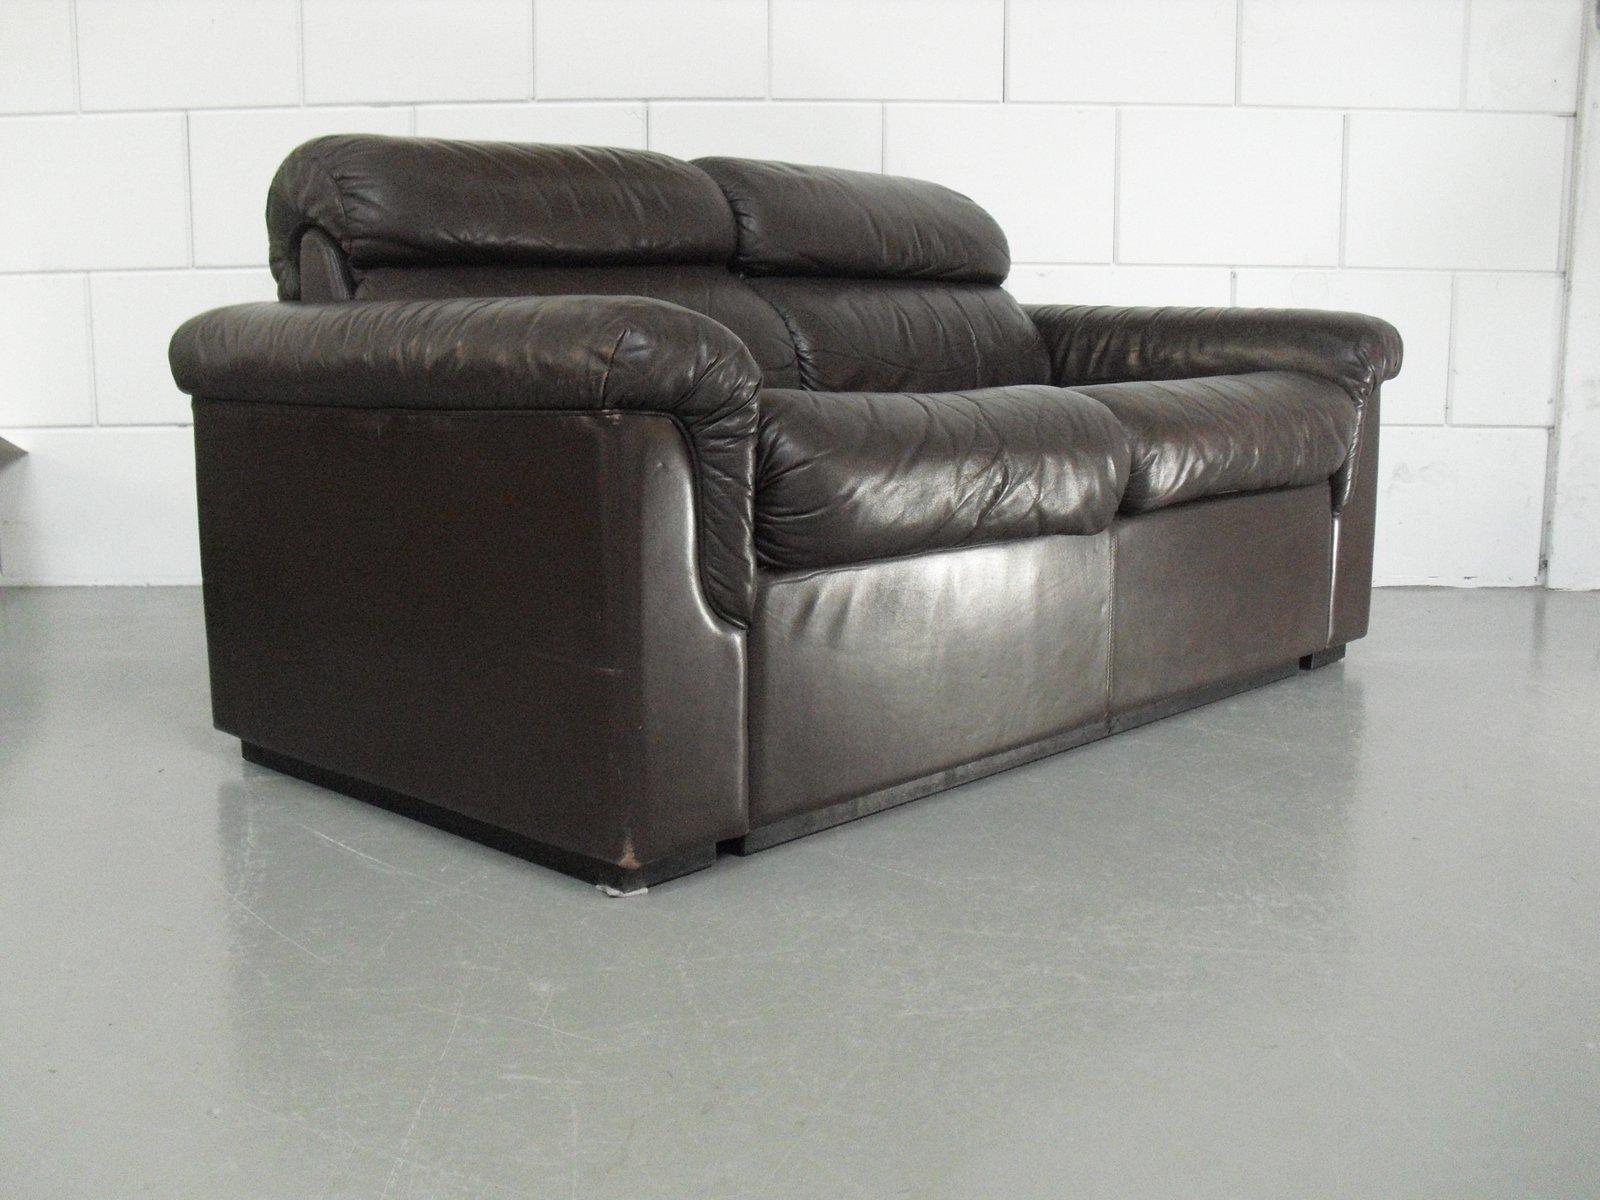 Two Seater Sofa Living Room Leather Two Seater Sofa And Chair Natashainanutshellcom